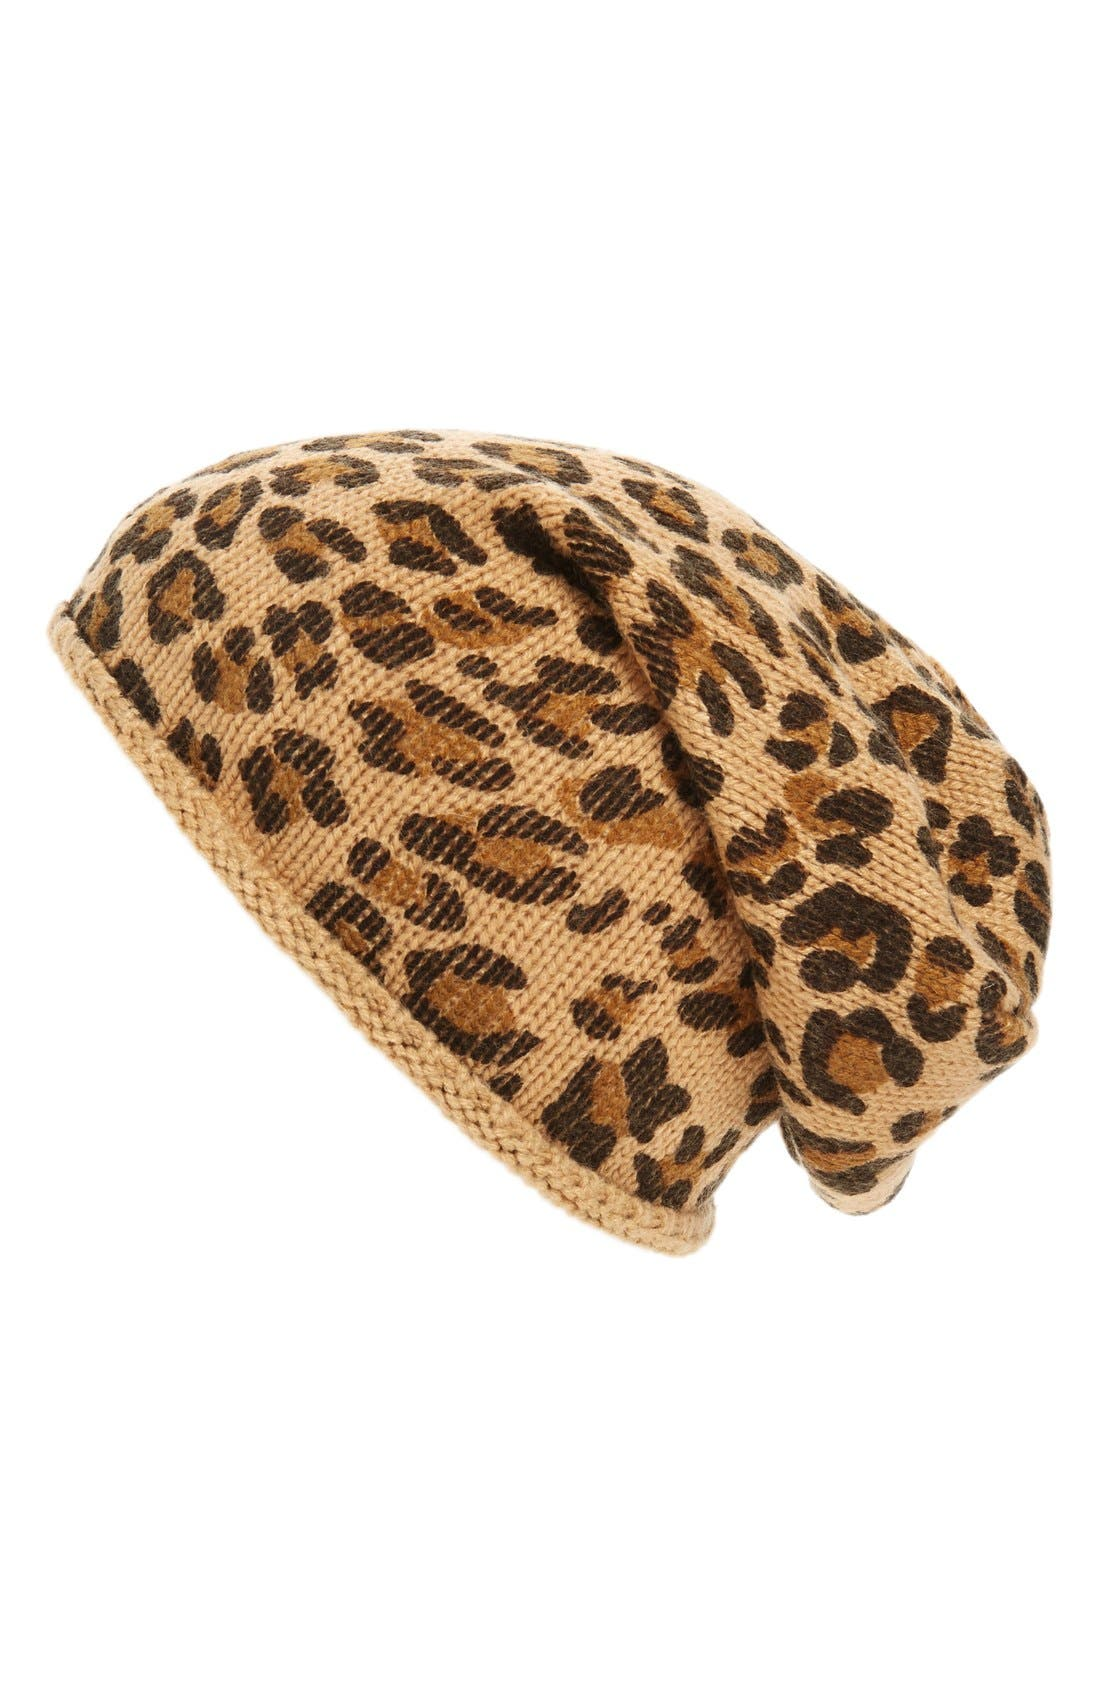 Alternate Image 1 Selected - BP. Leopard Print Slouchy Beanie